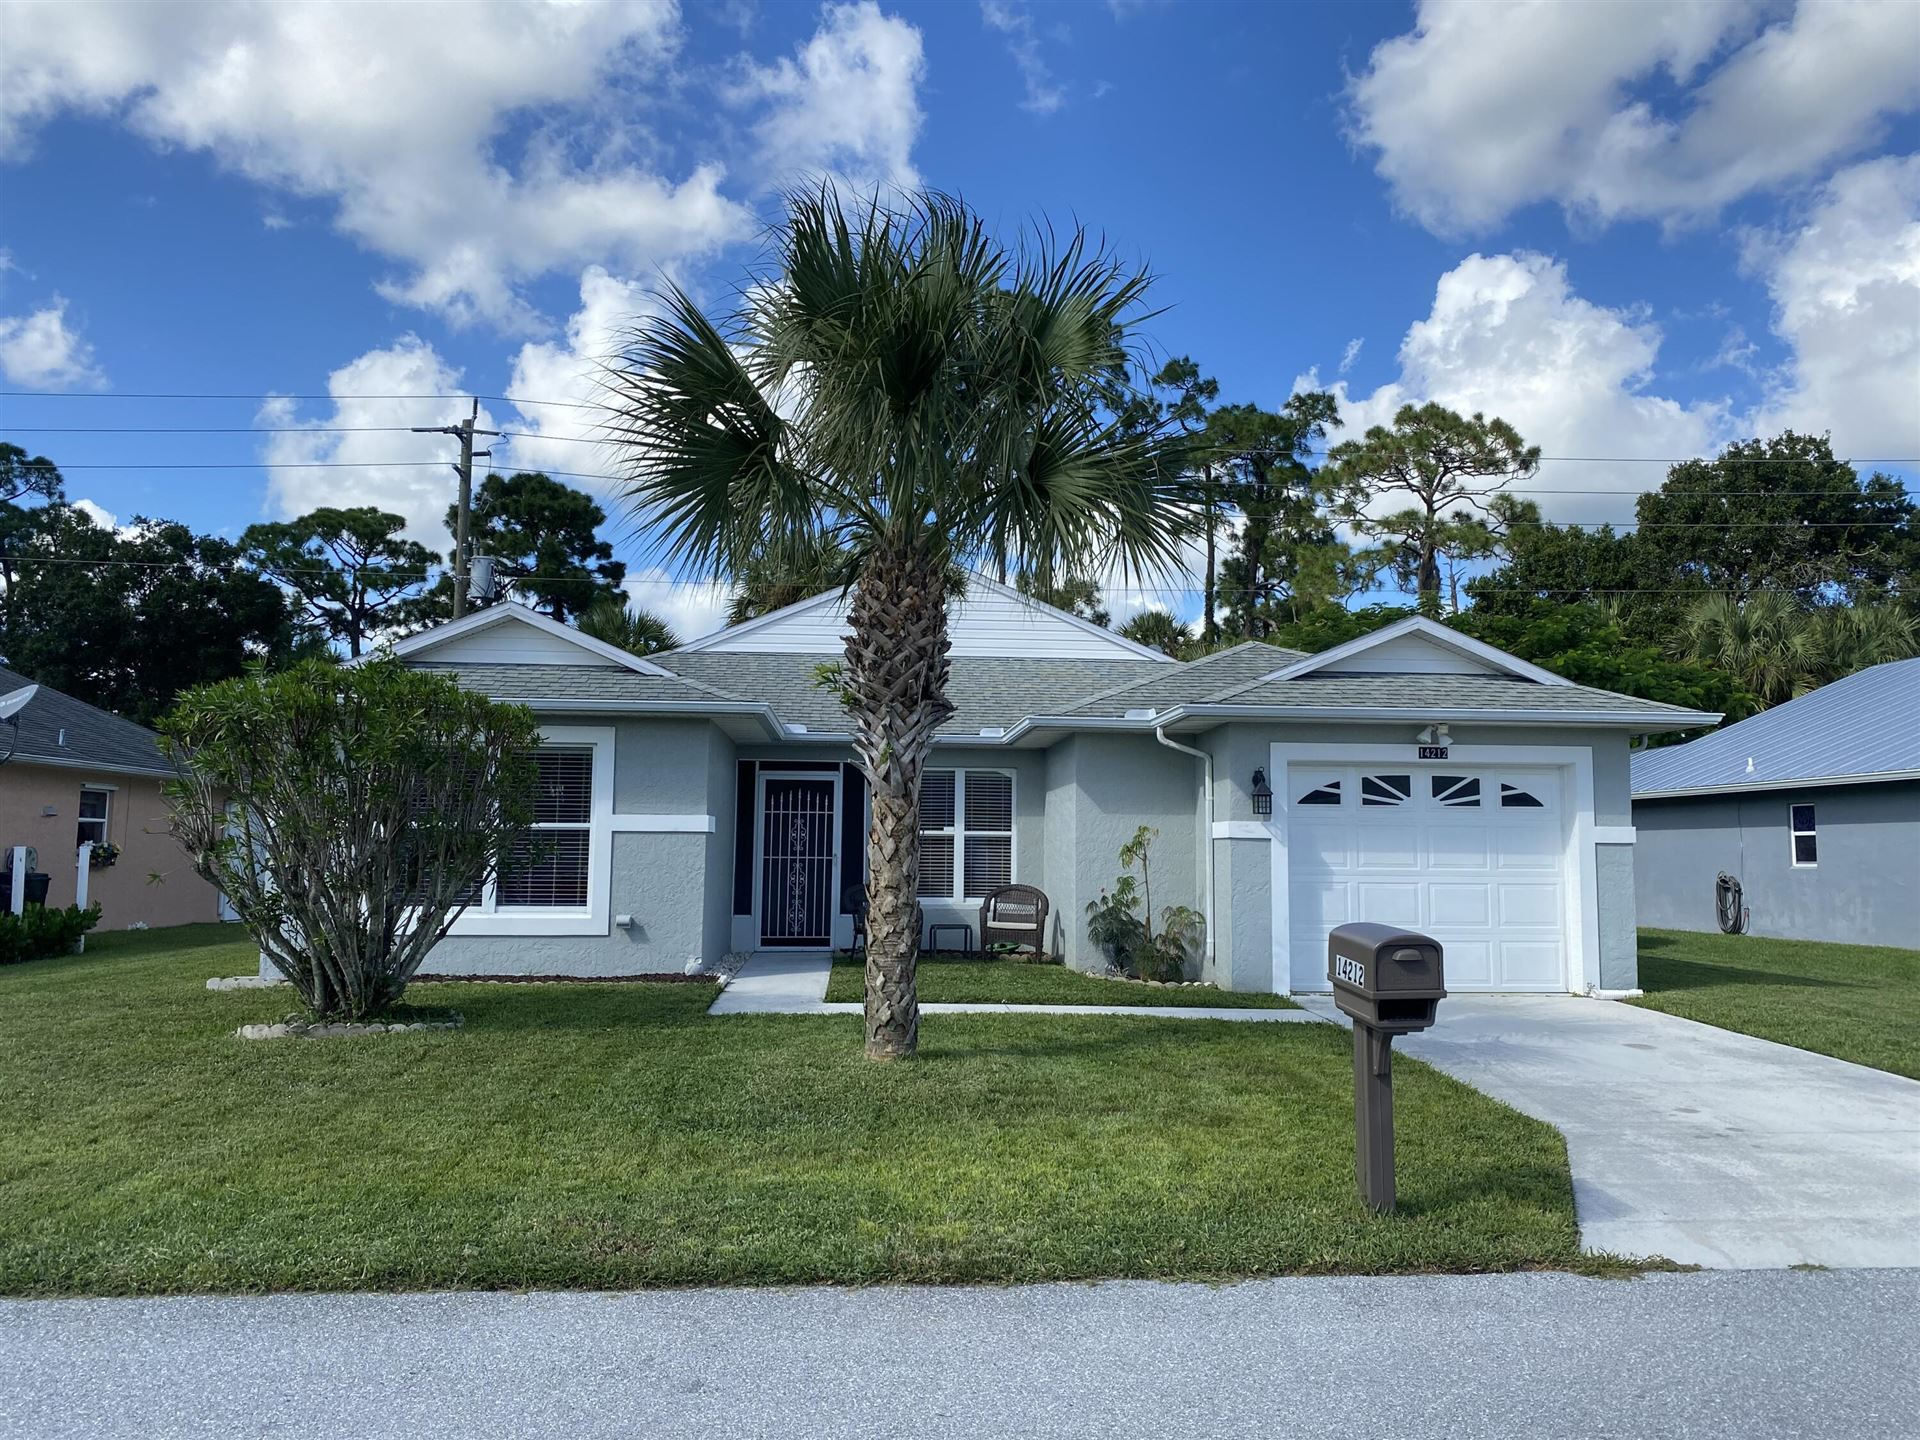 14212 Aguila, Fort Pierce, FL 34951 - #: RX-10750911